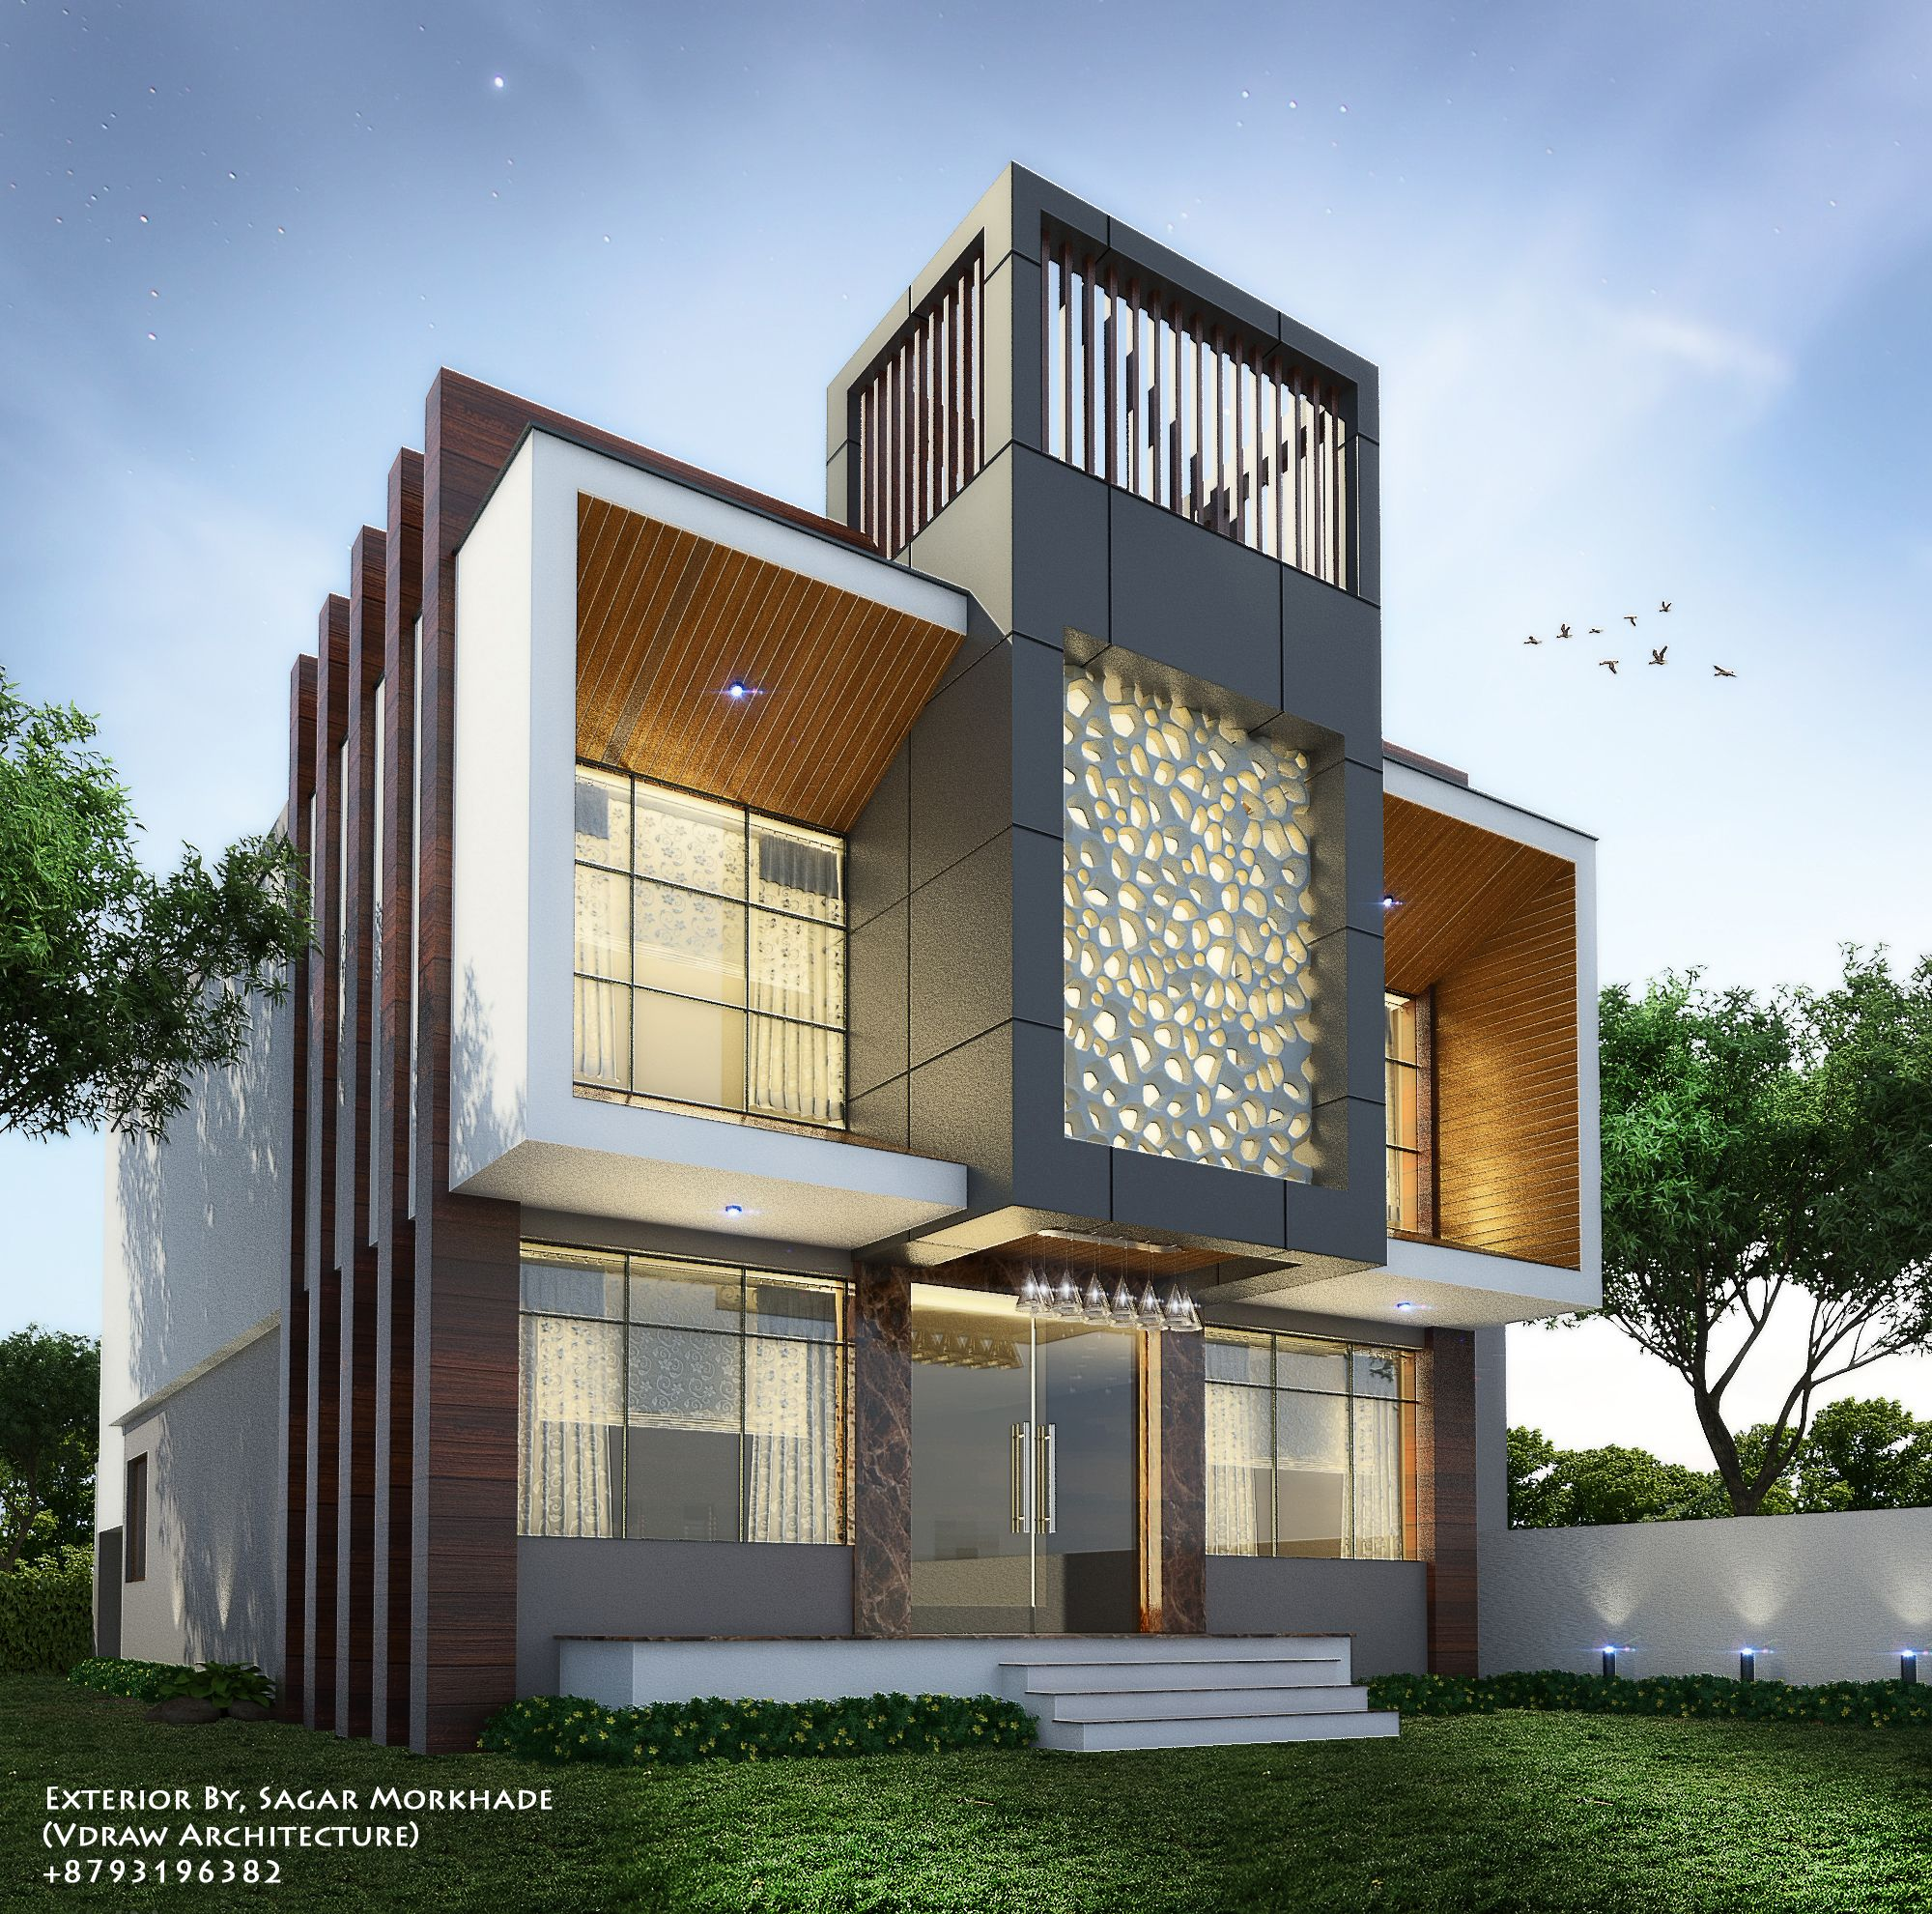 Exterior By, Sagar Morkhade (Vdraw Architecture